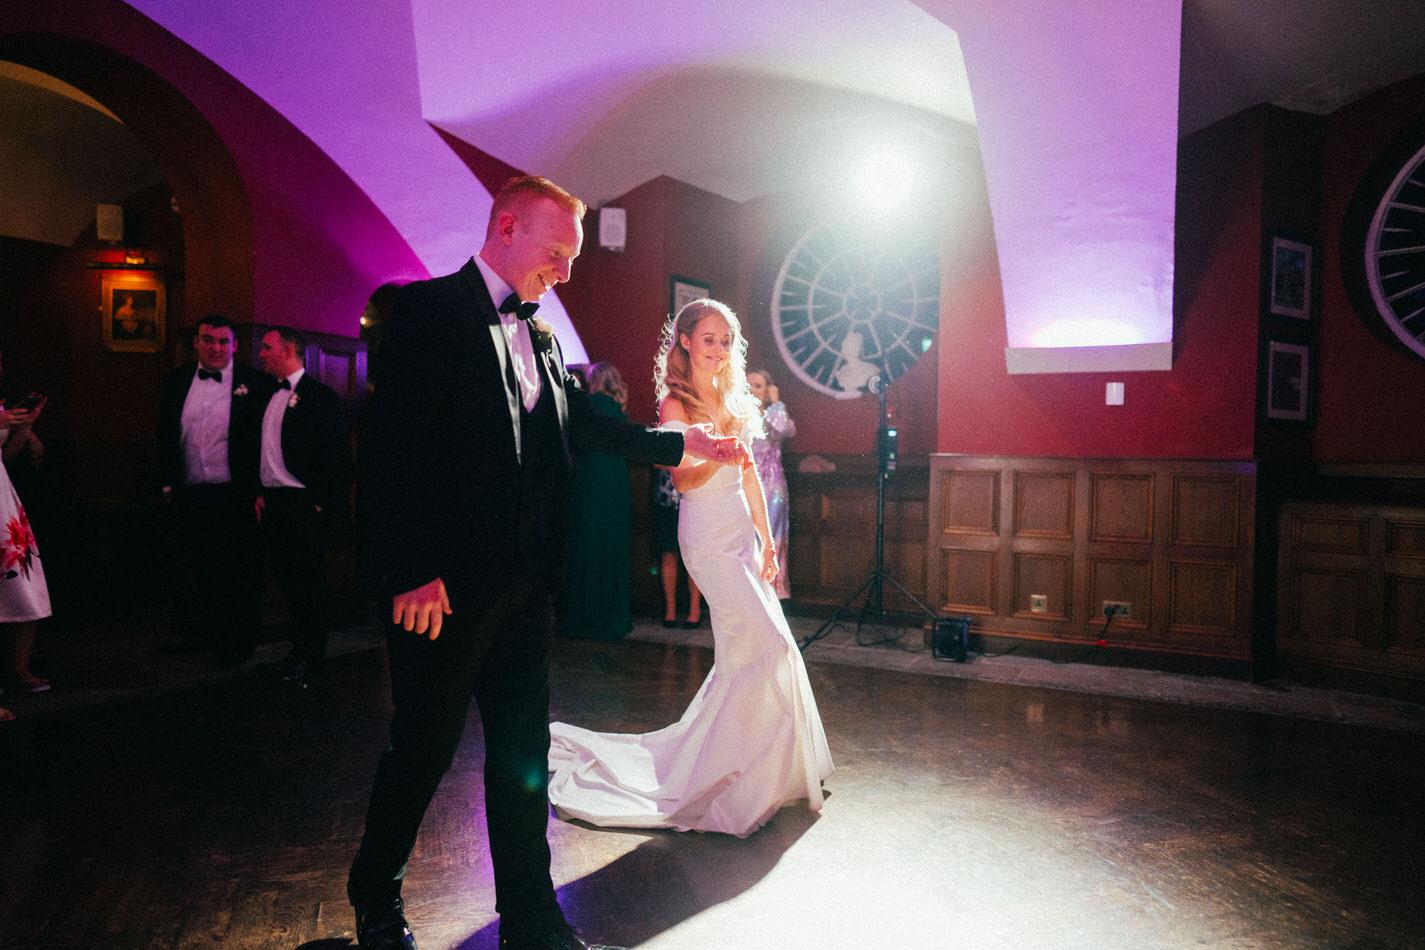 Castle-wedding-ireland-photos- 0321 235